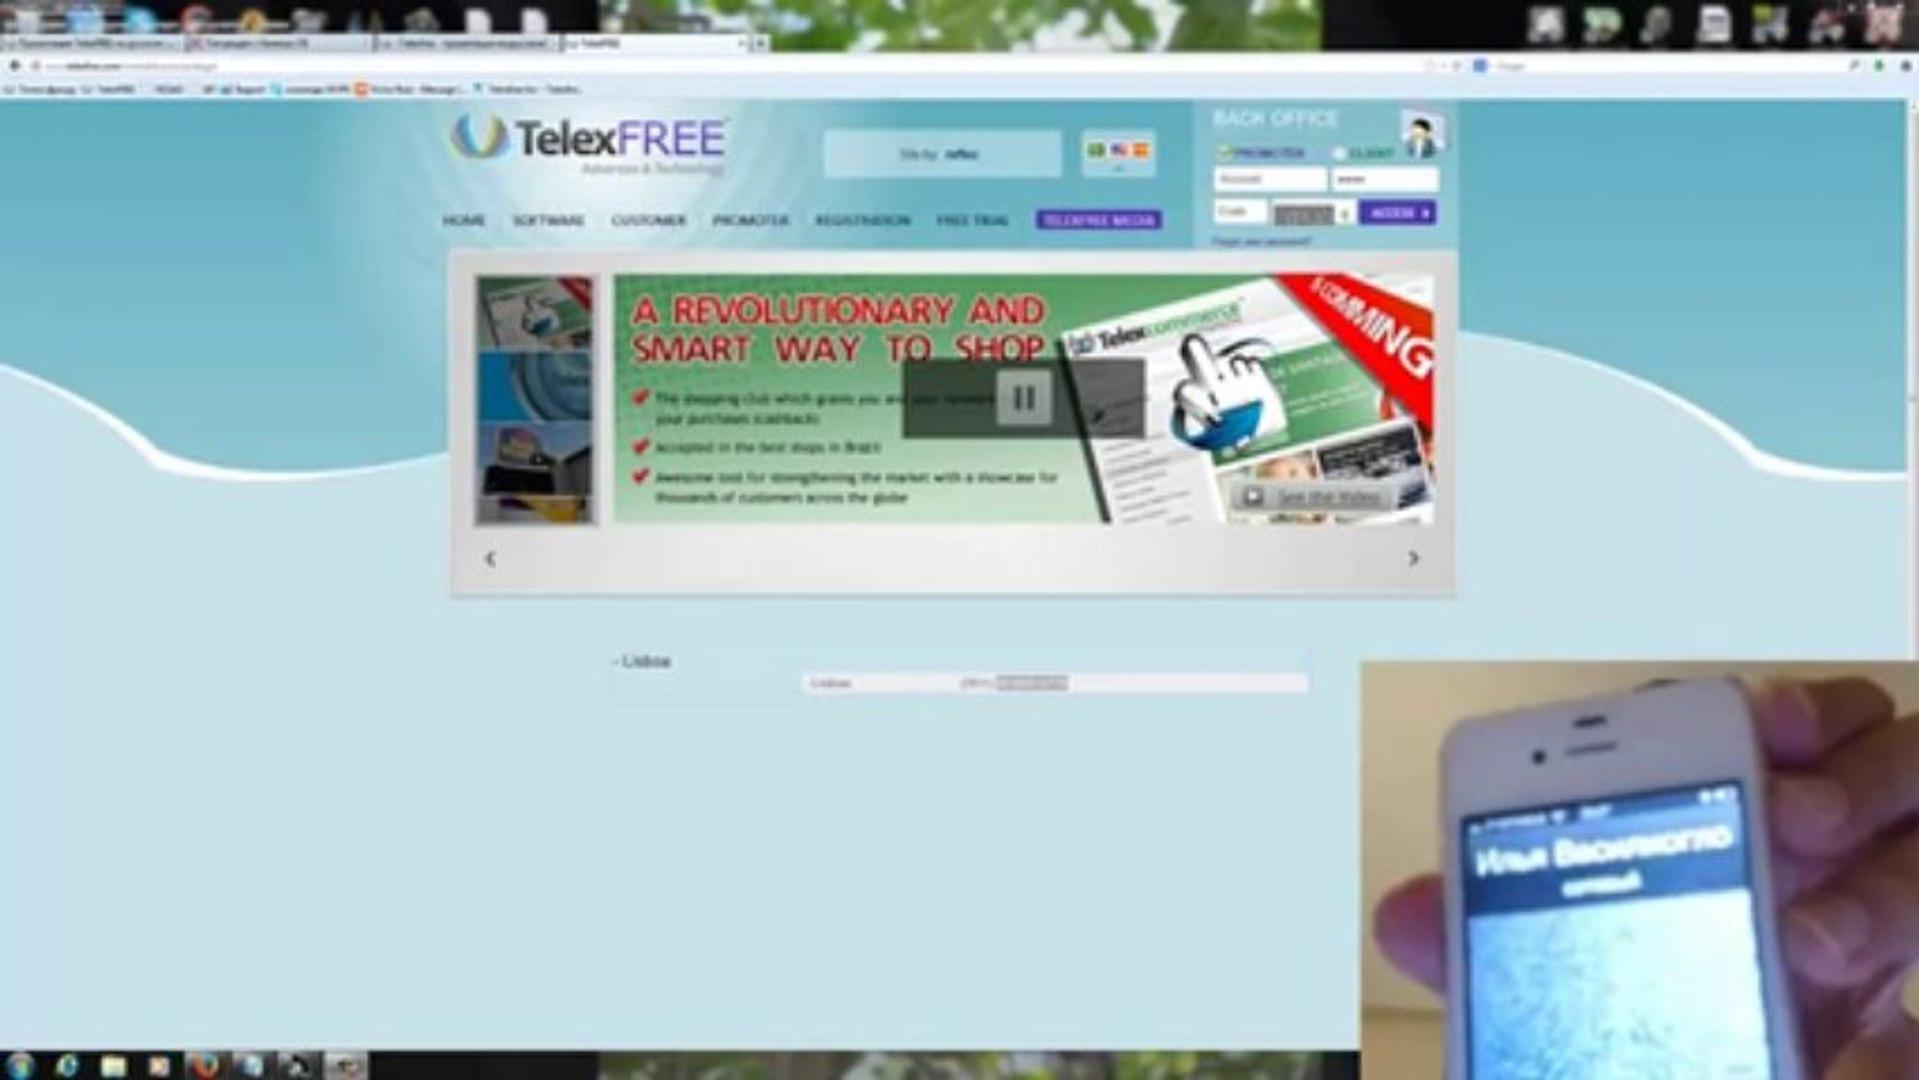 TelexFREE - качественная связь через Call-center (1)